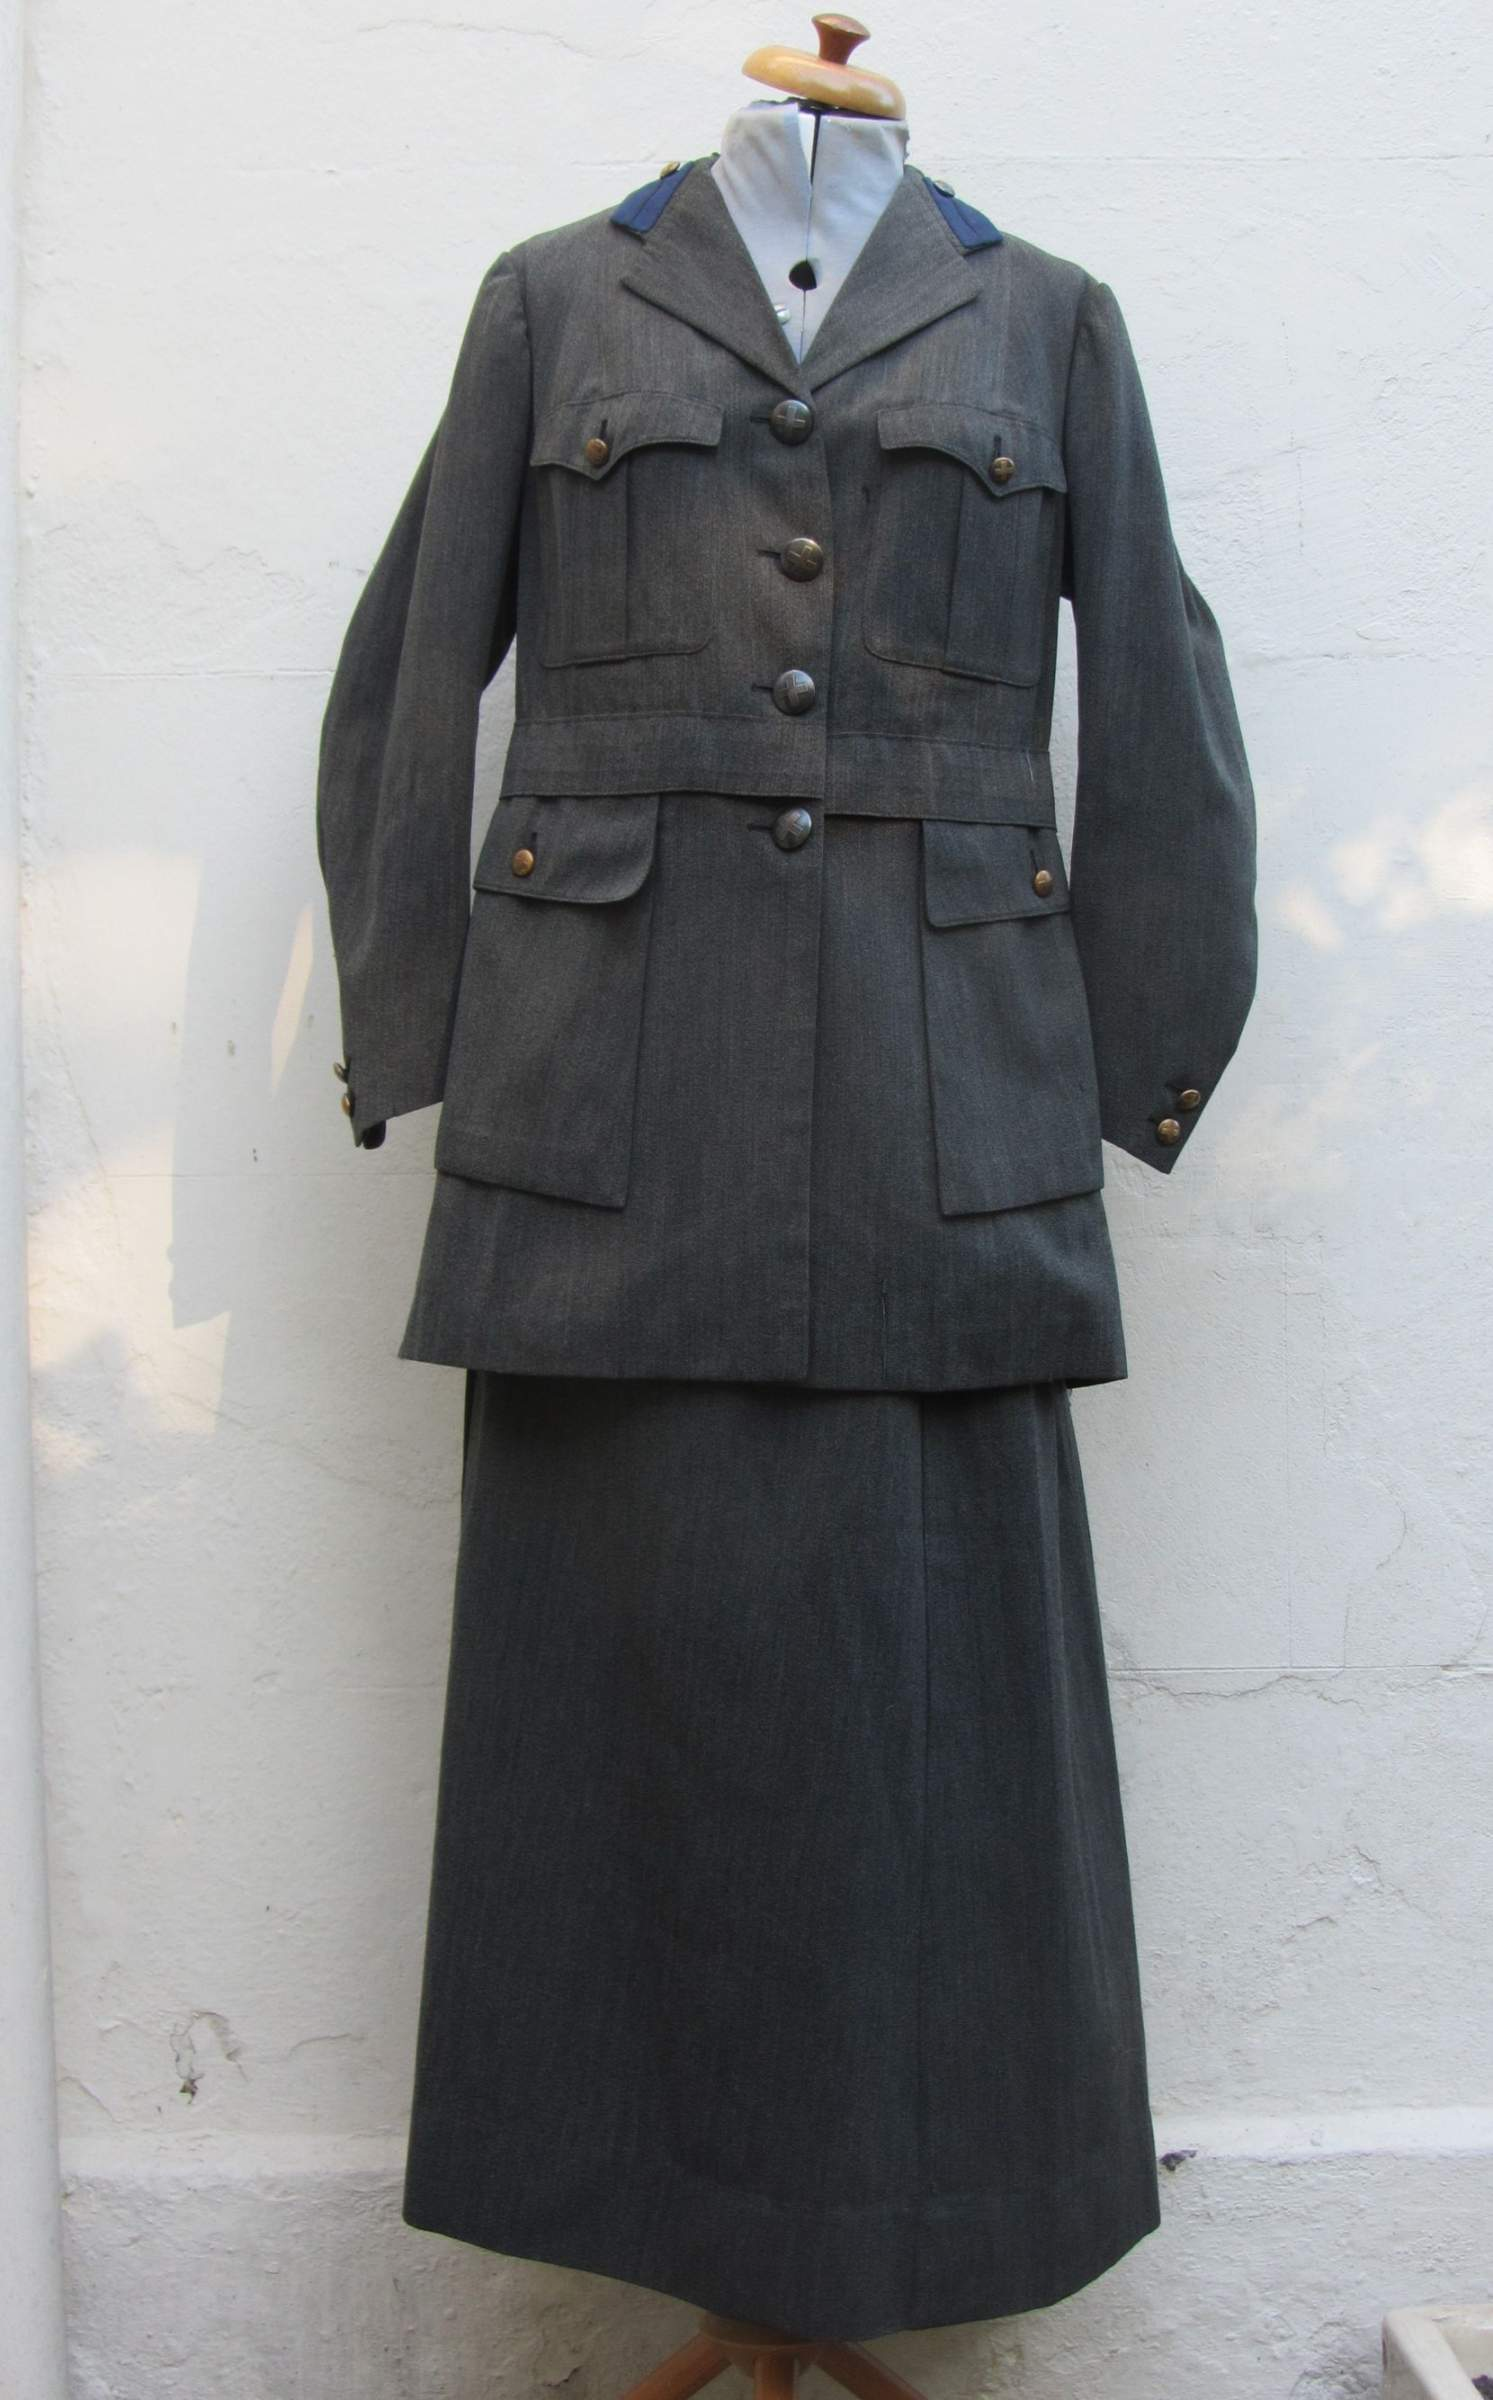 WW2 alemán - estadounidense uniformes, equipo de campo, insignias